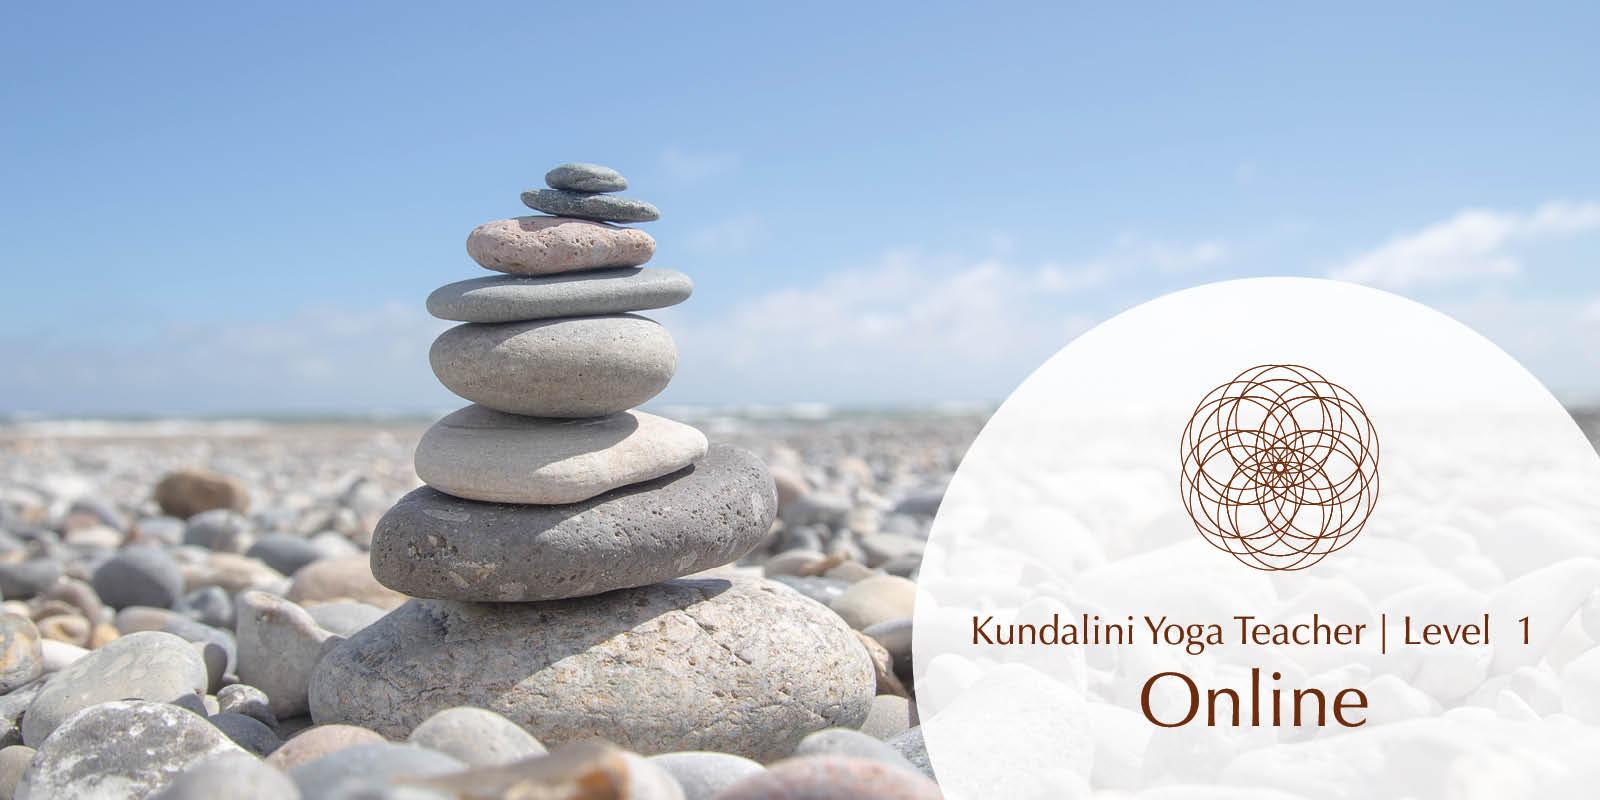 prana jio online yoga ausbildung